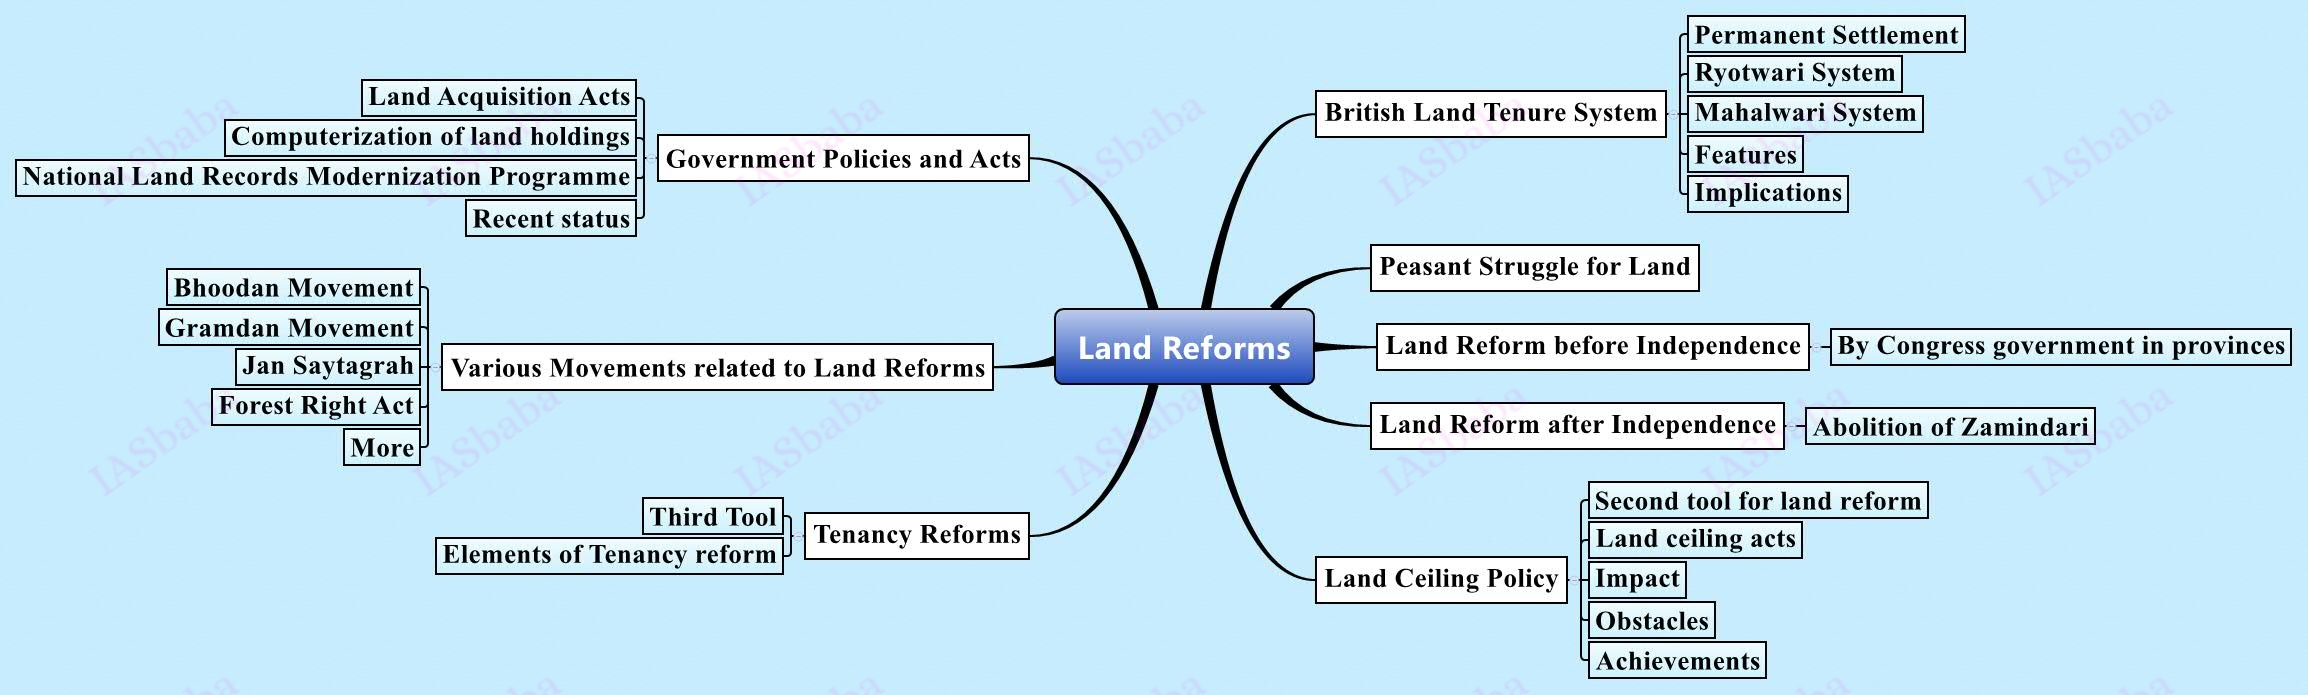 Land-Reforms